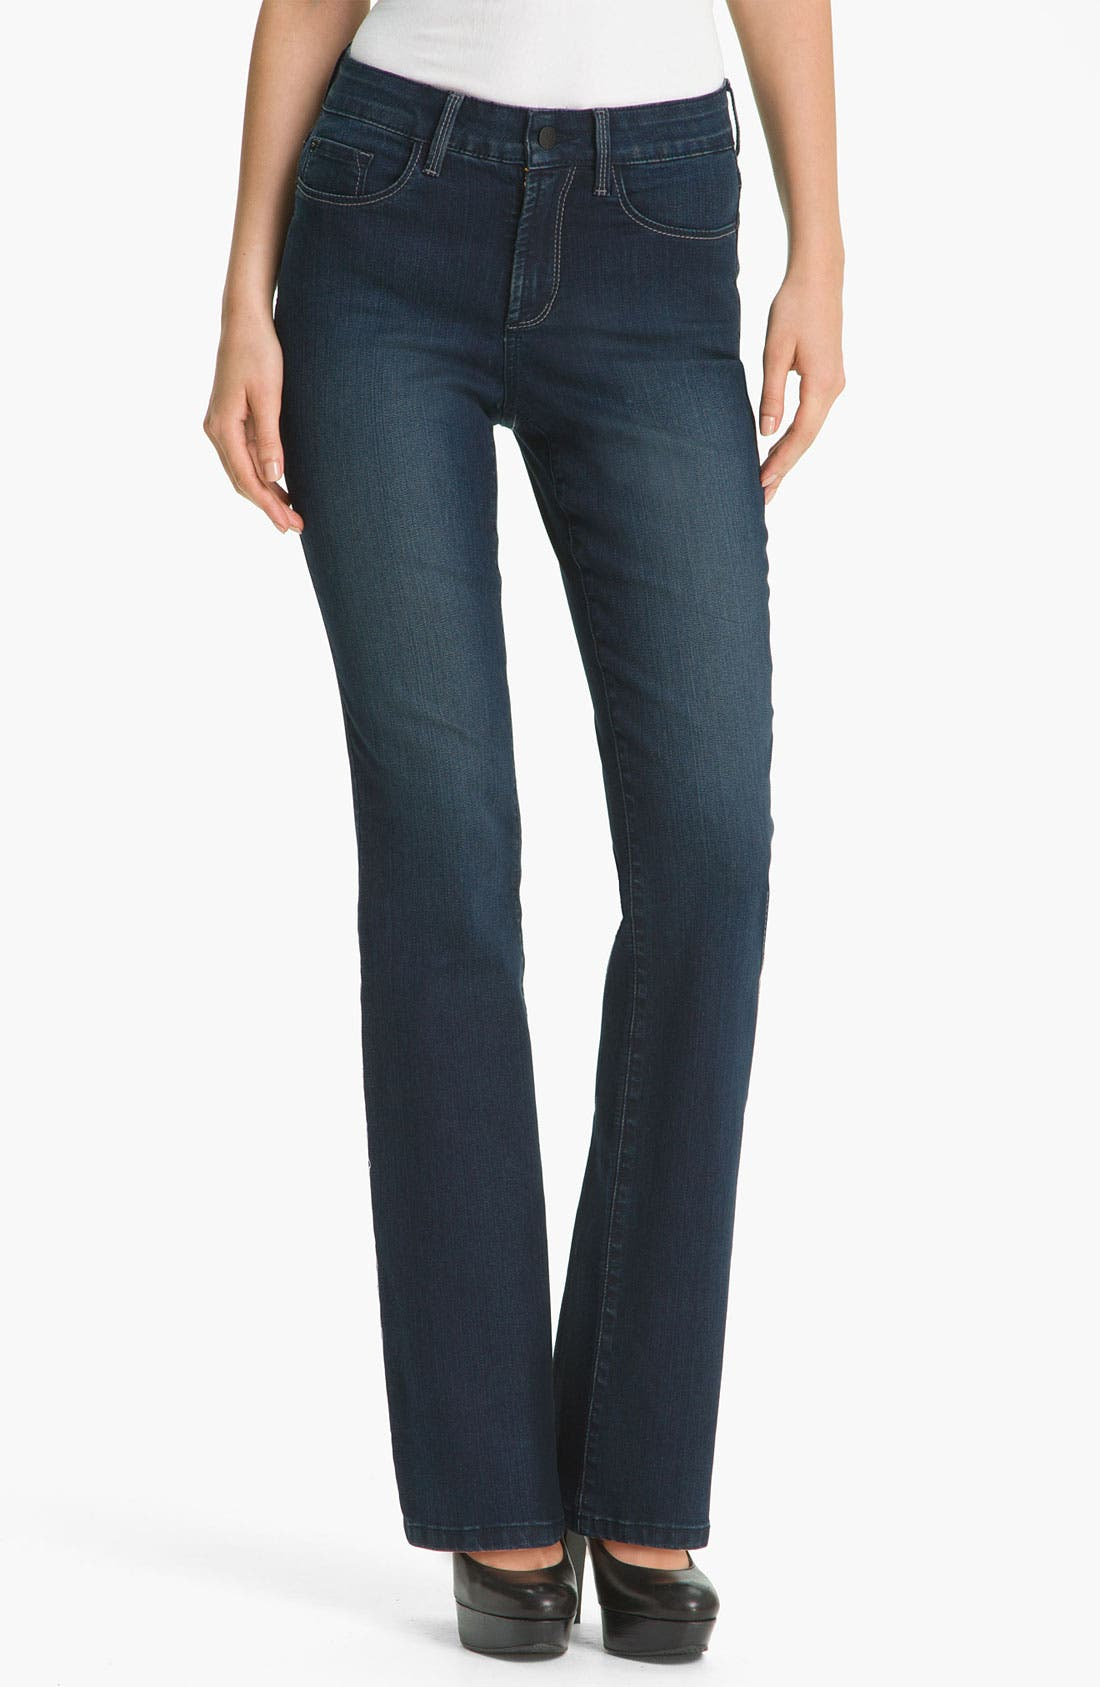 Alternate Image 1 Selected - NYDJ 'Barbara' Bootcut Jeans (Petite)